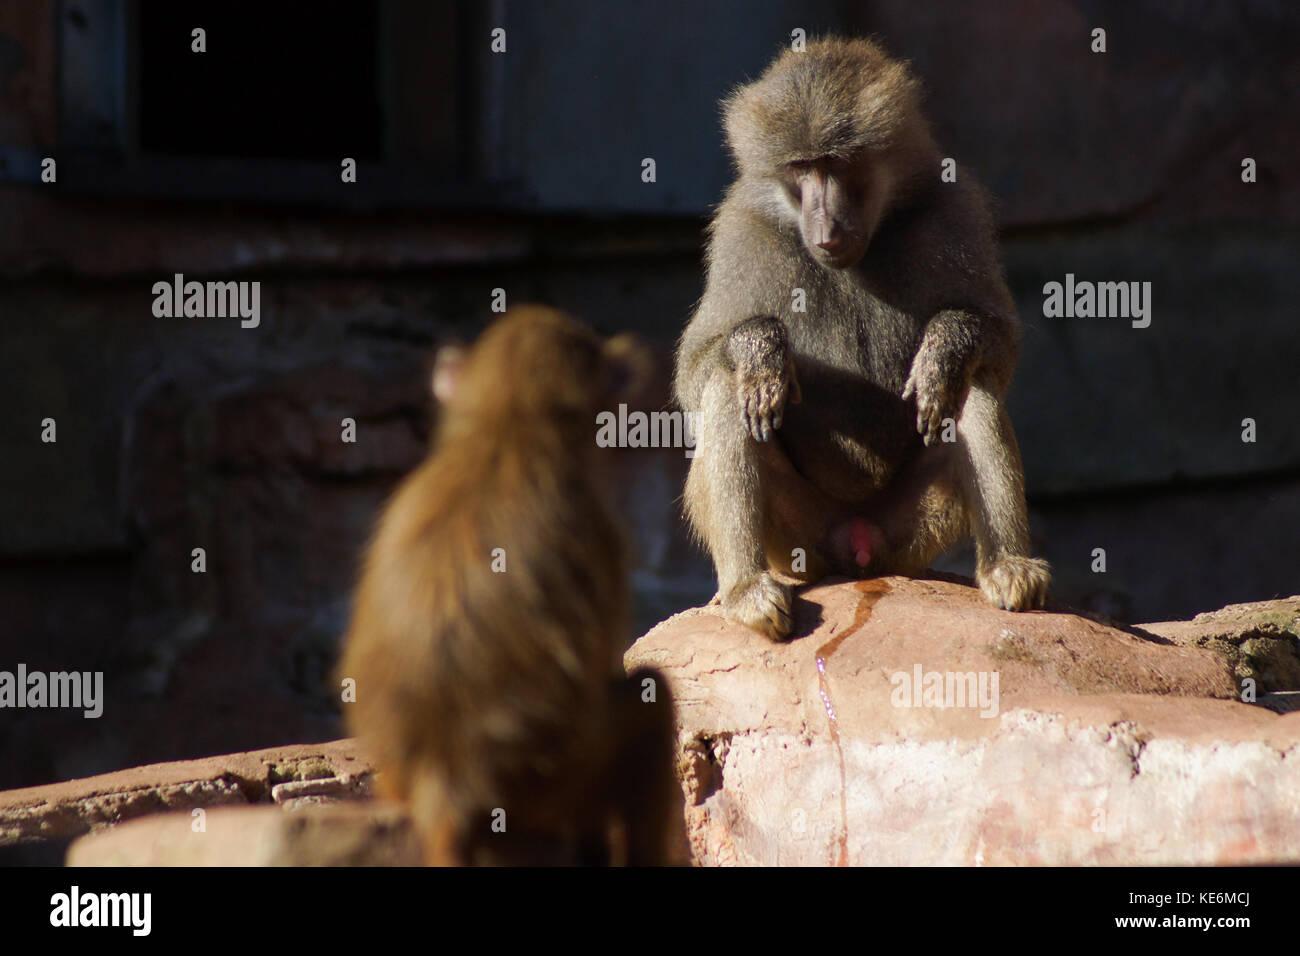 Baboons sit on a rock in Devon, UK - Stock Image